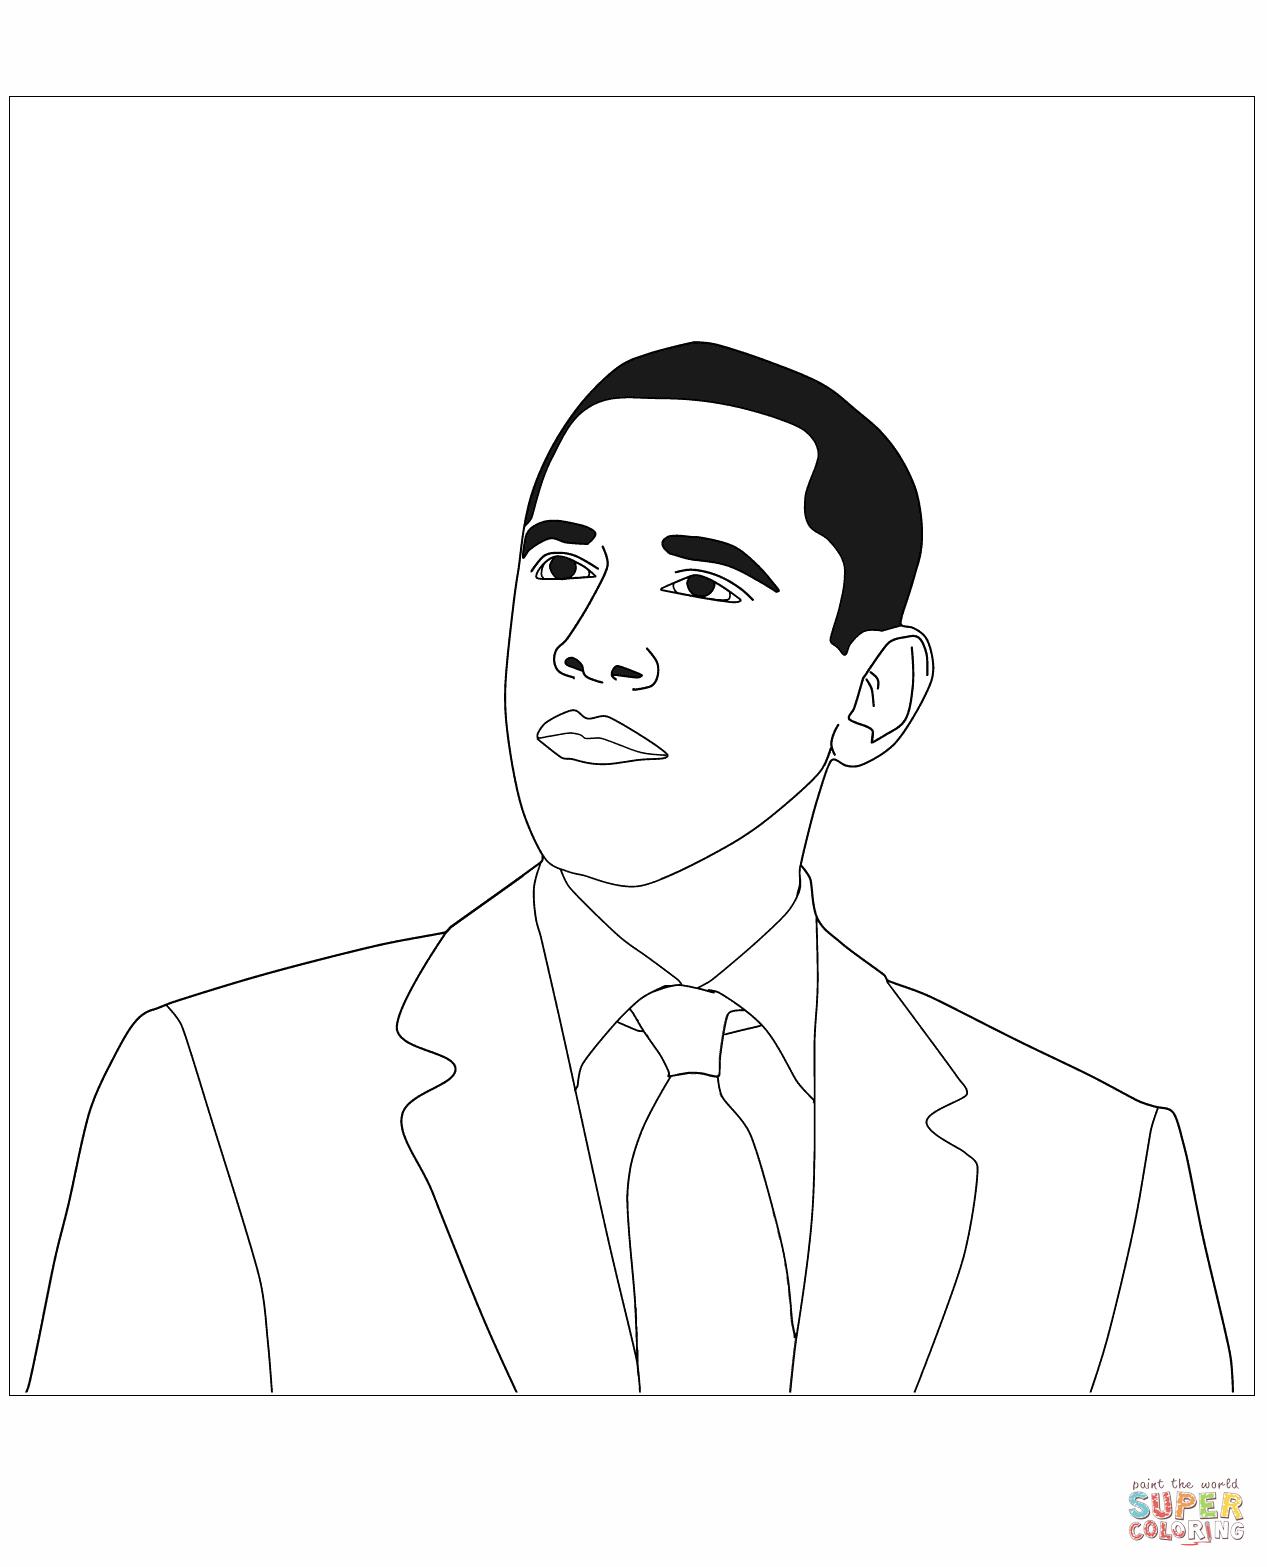 President Barack Obama Coloring Page